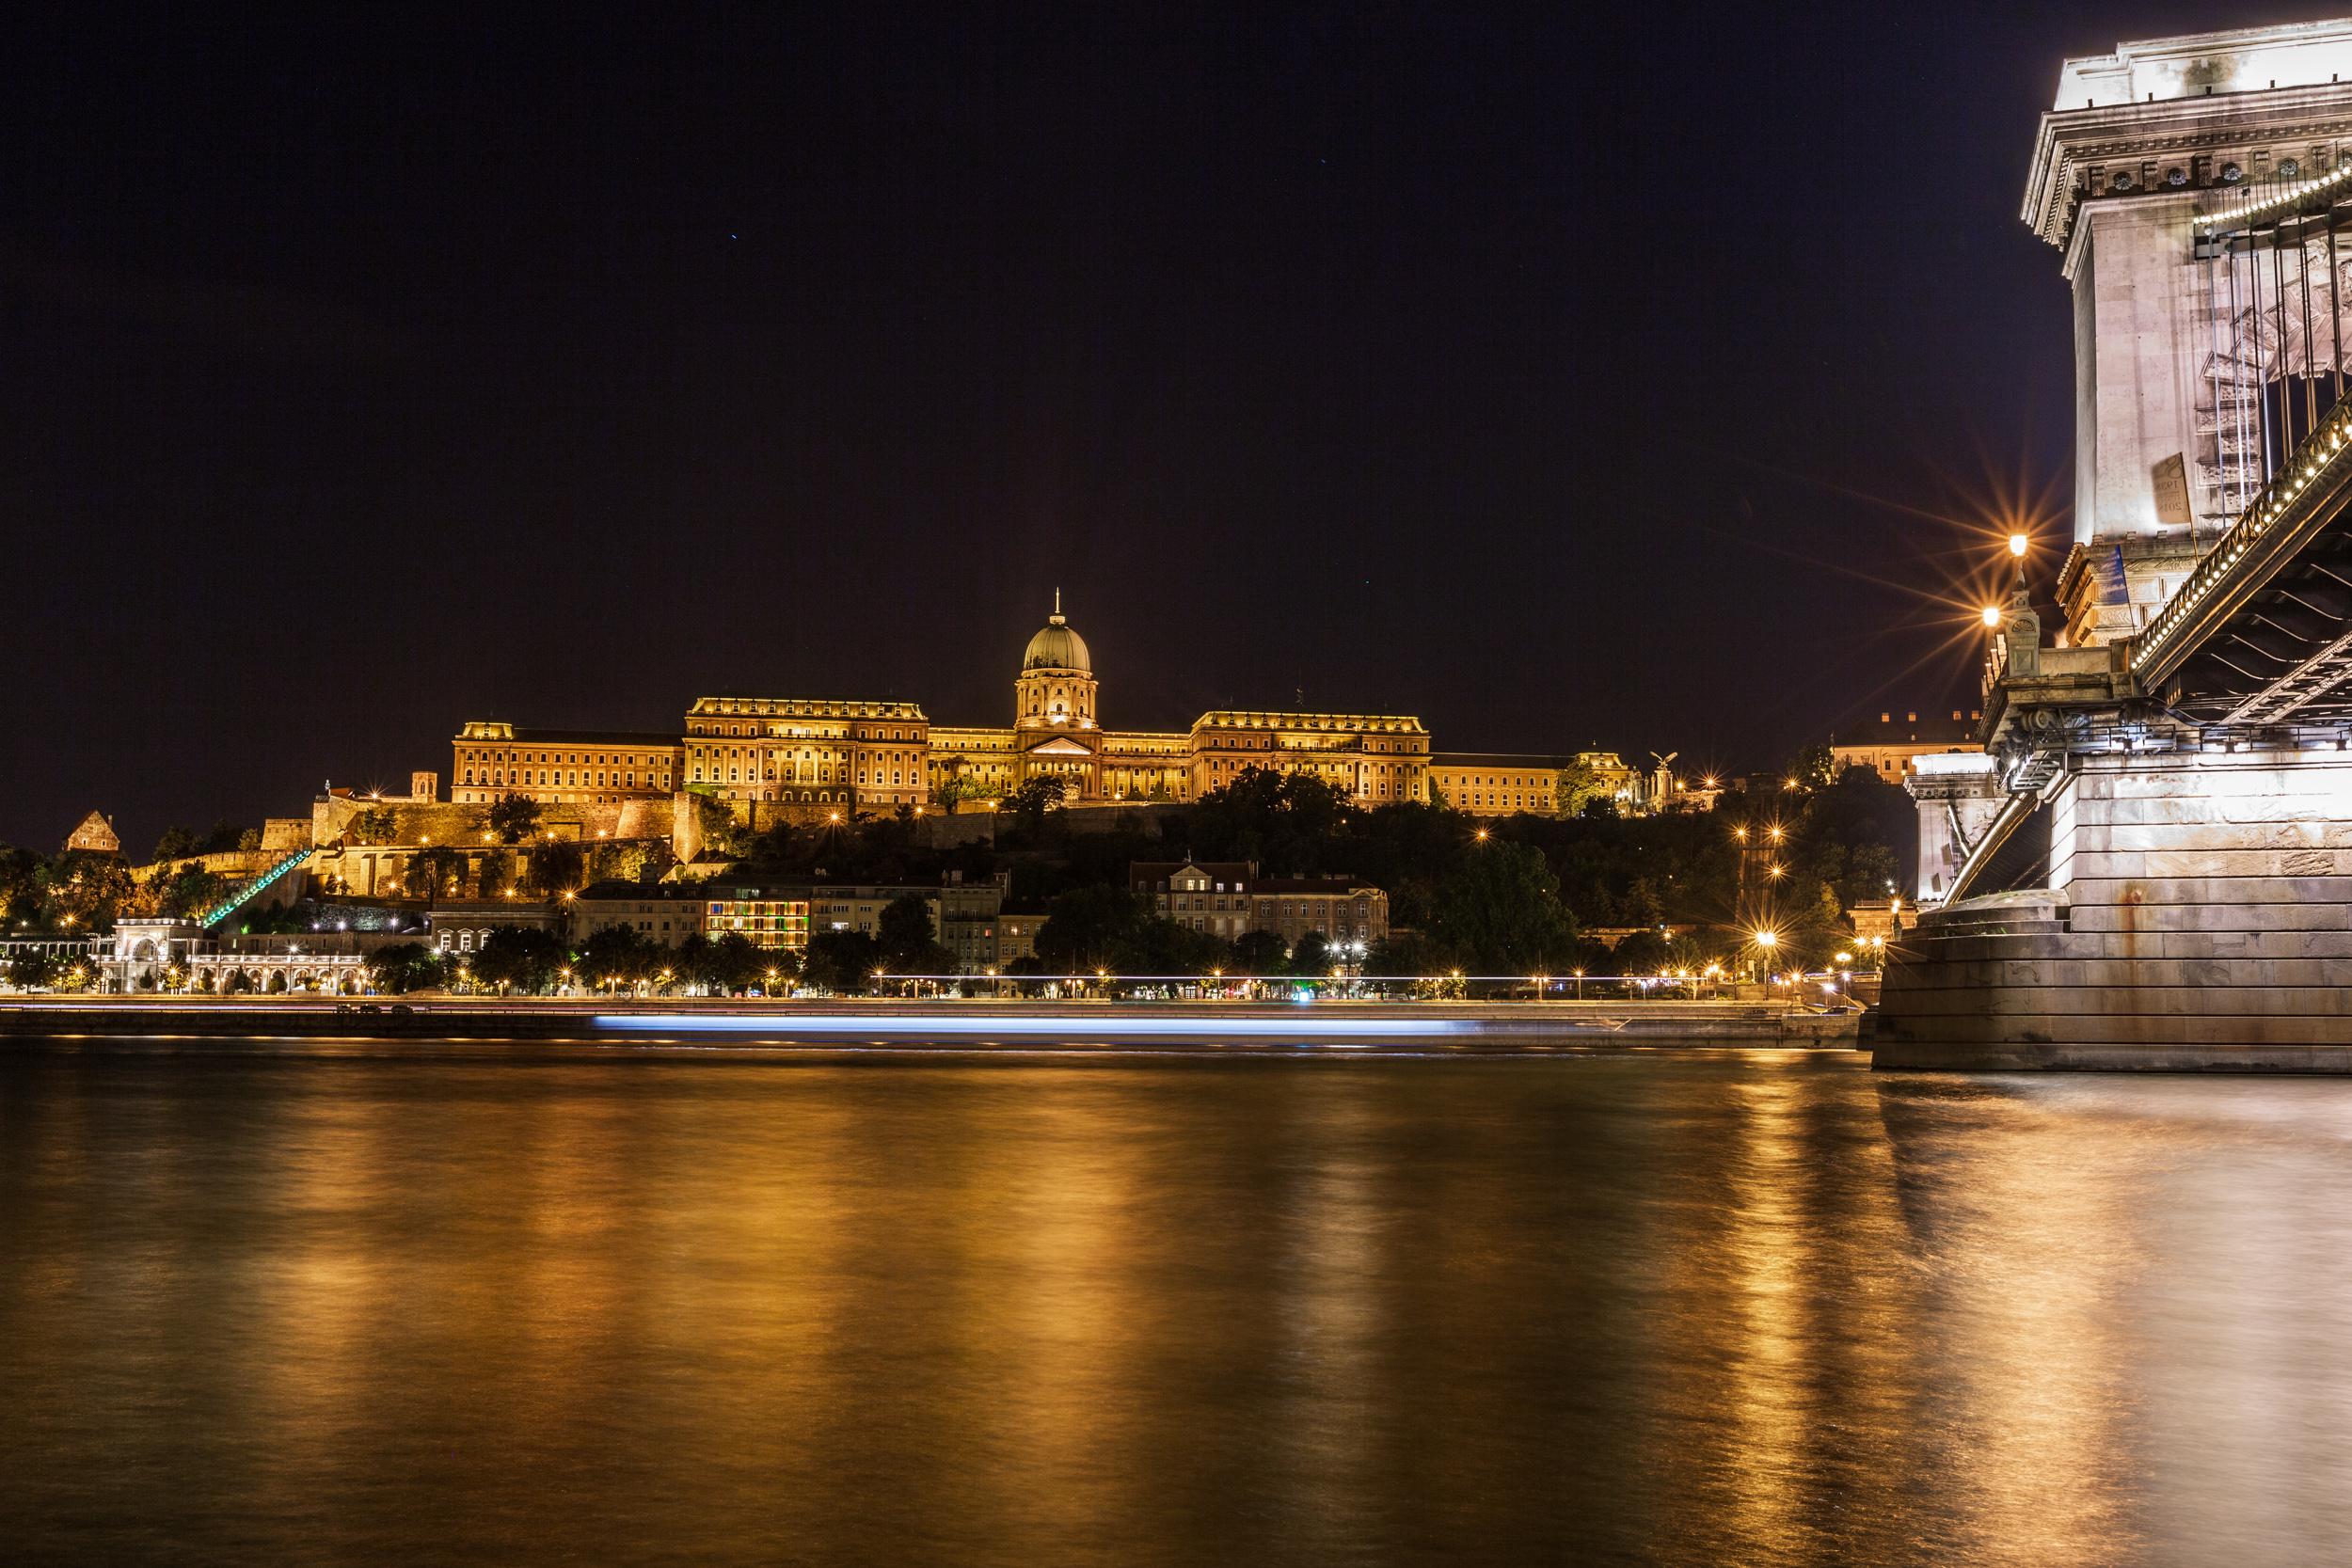 Buda Castle. ISO100, 35mm, f/13, 20sec